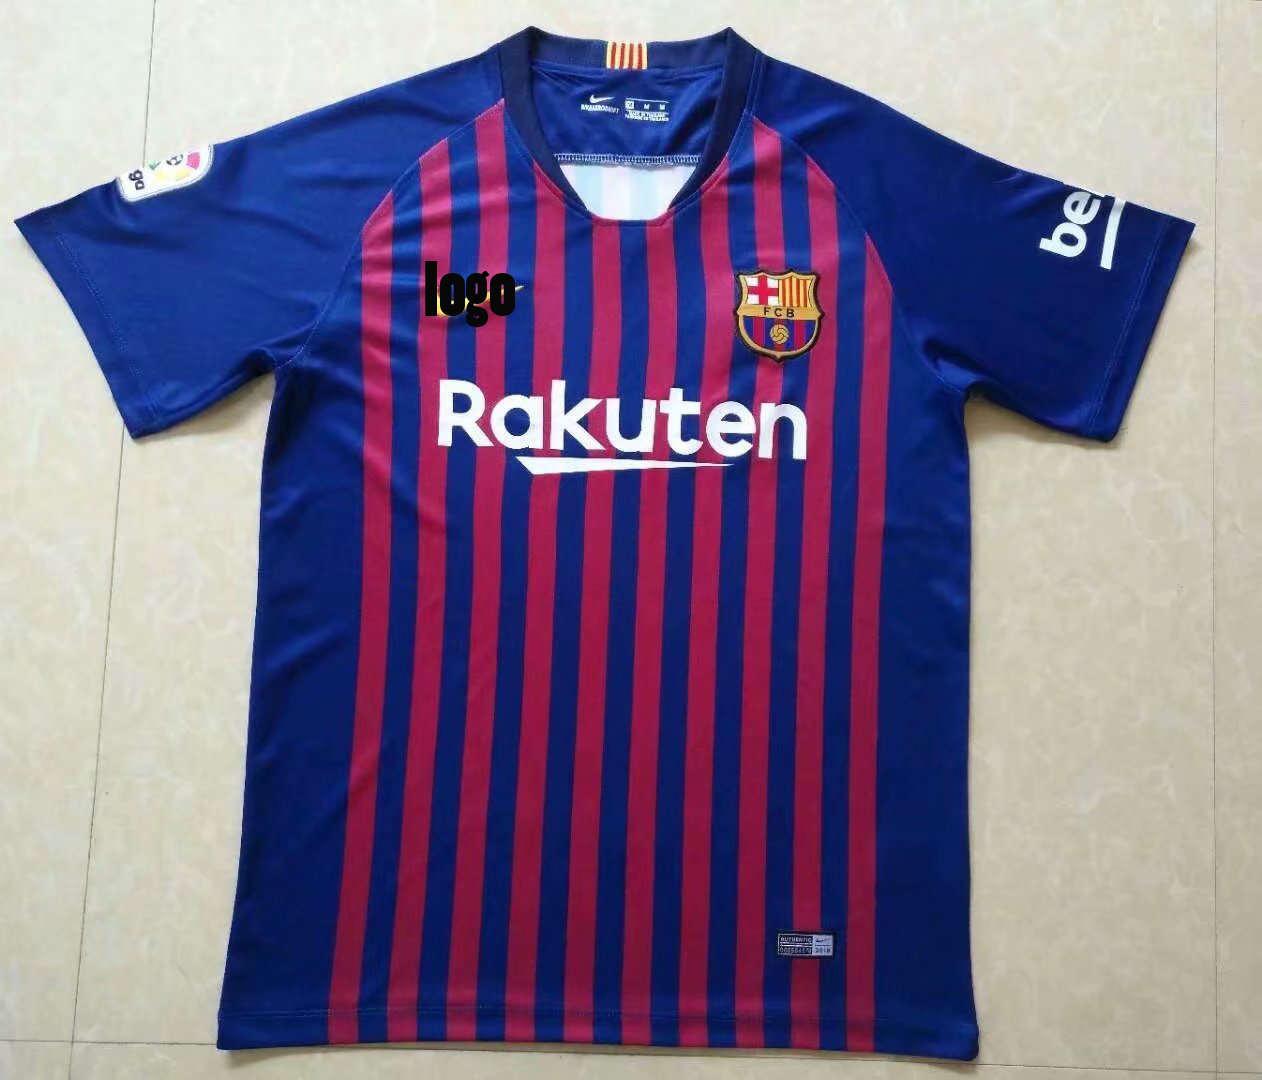 9f44e5b6010 2018 19 Cheap Replica Futbol Club de Bacelona Soccer Jersey Custom FCB  Football shirts